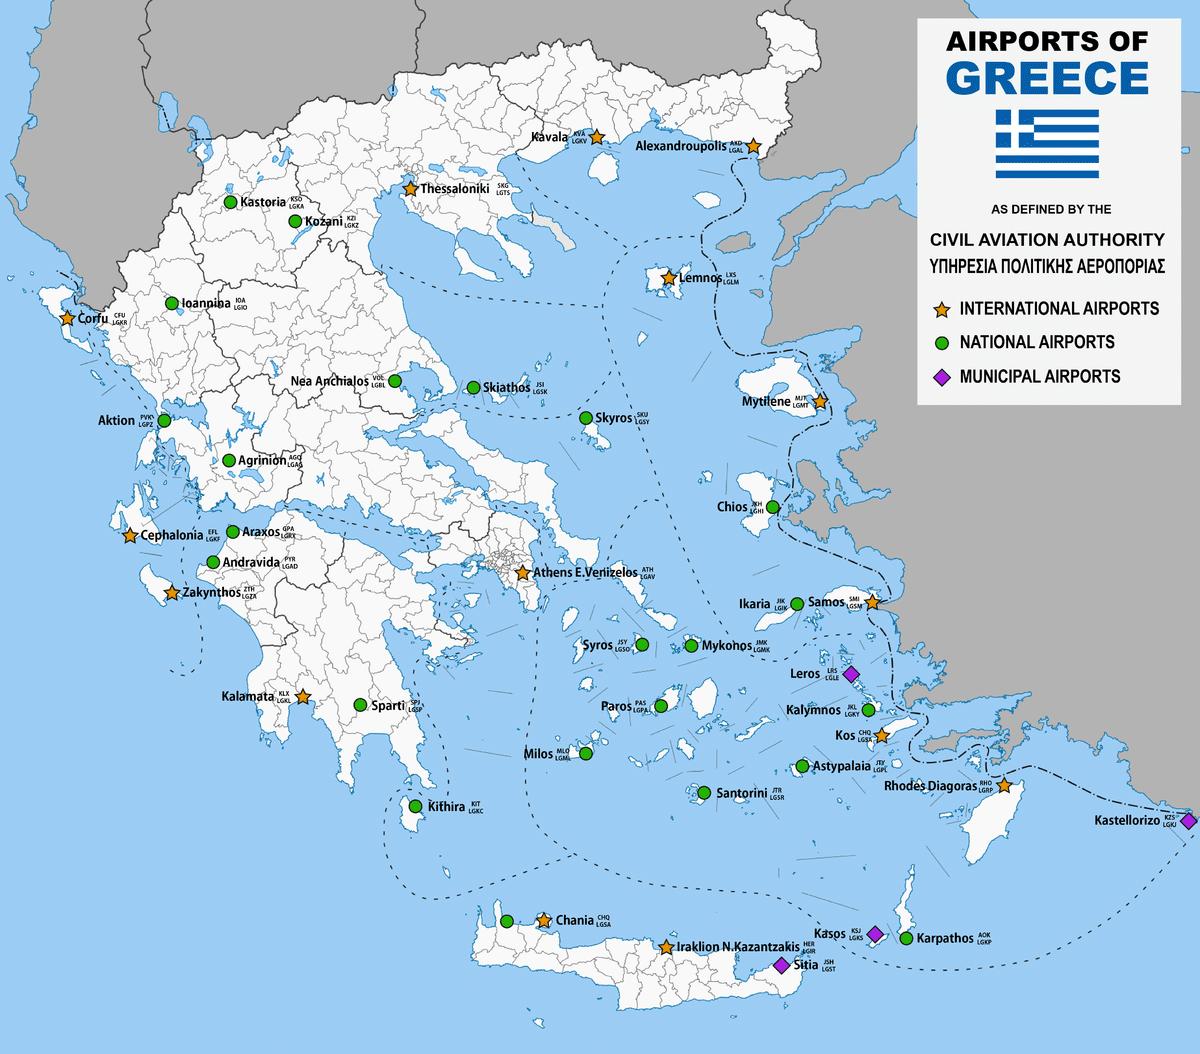 Аэропорты Греции на карте